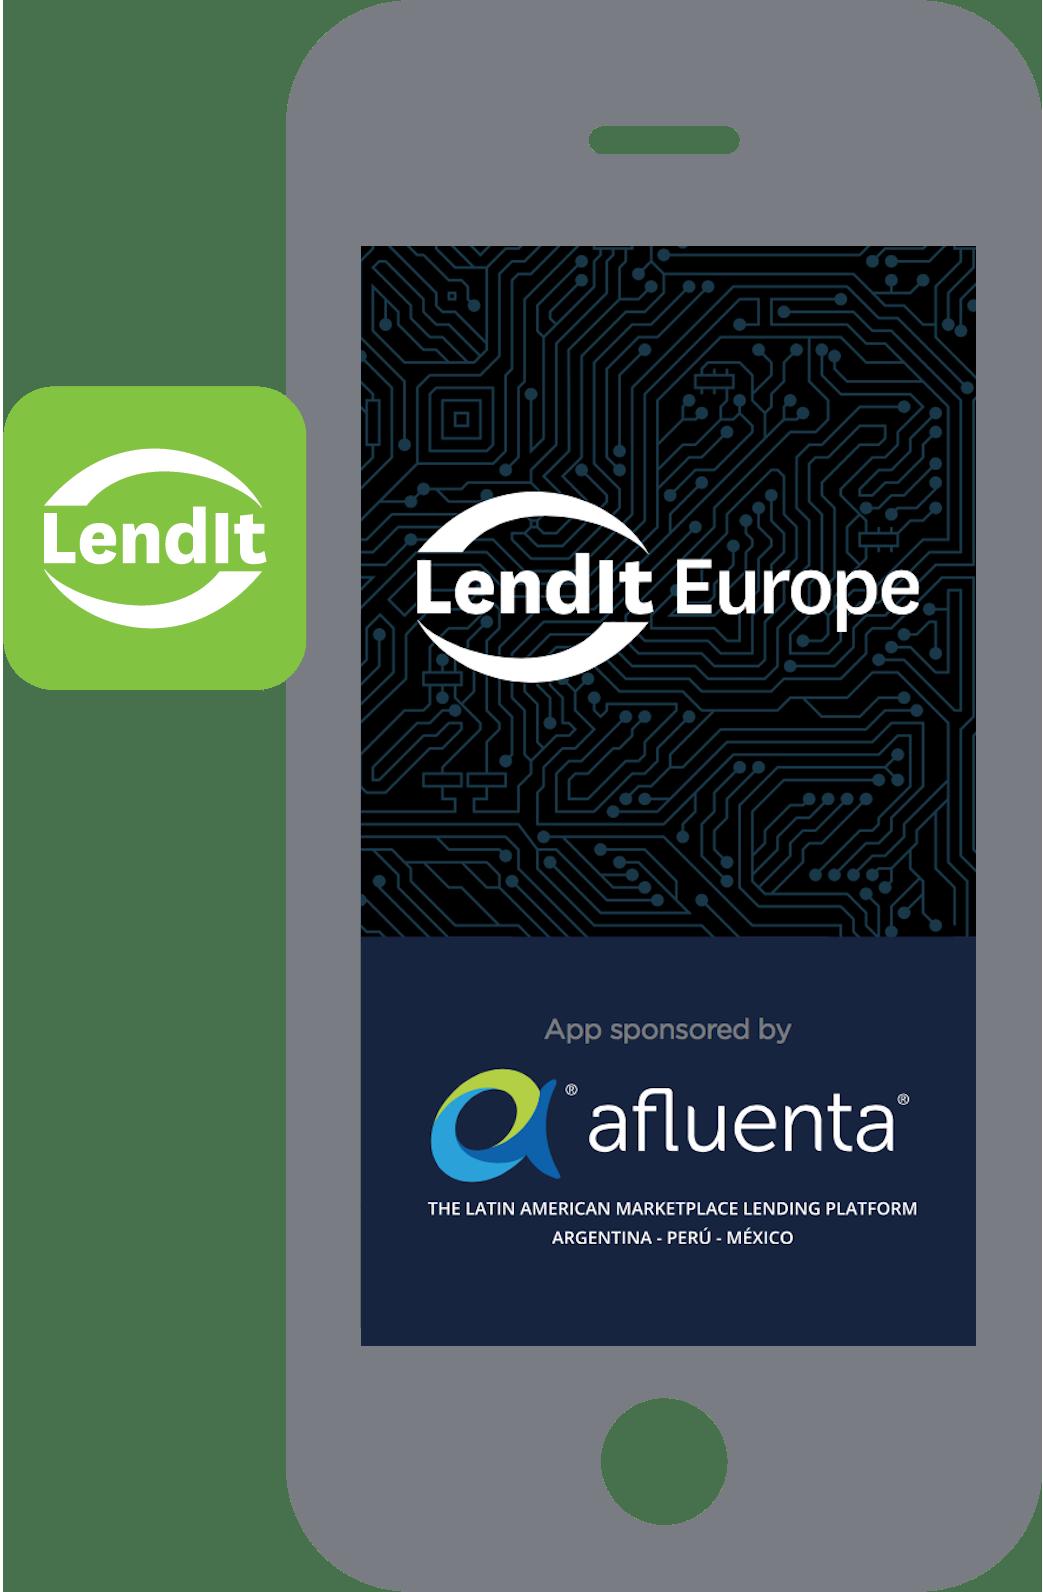 lendit app sponsored by afluenta